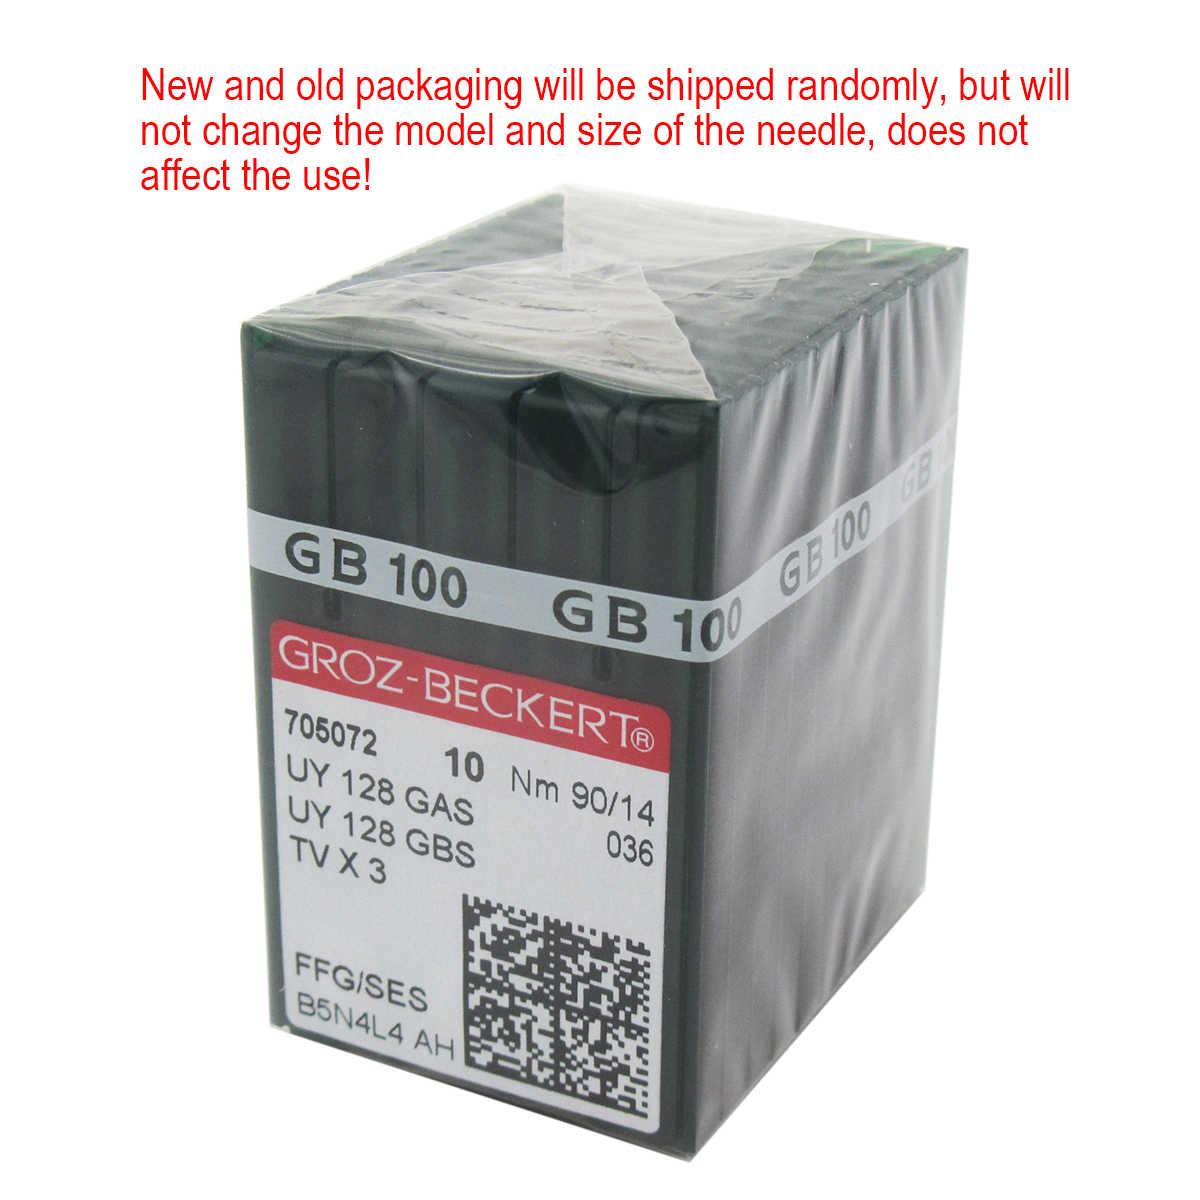 Tv X 3 tamaño 80//12 Groz-Beckert Industrial Coverstitch Agujas de máquina UY128 gas